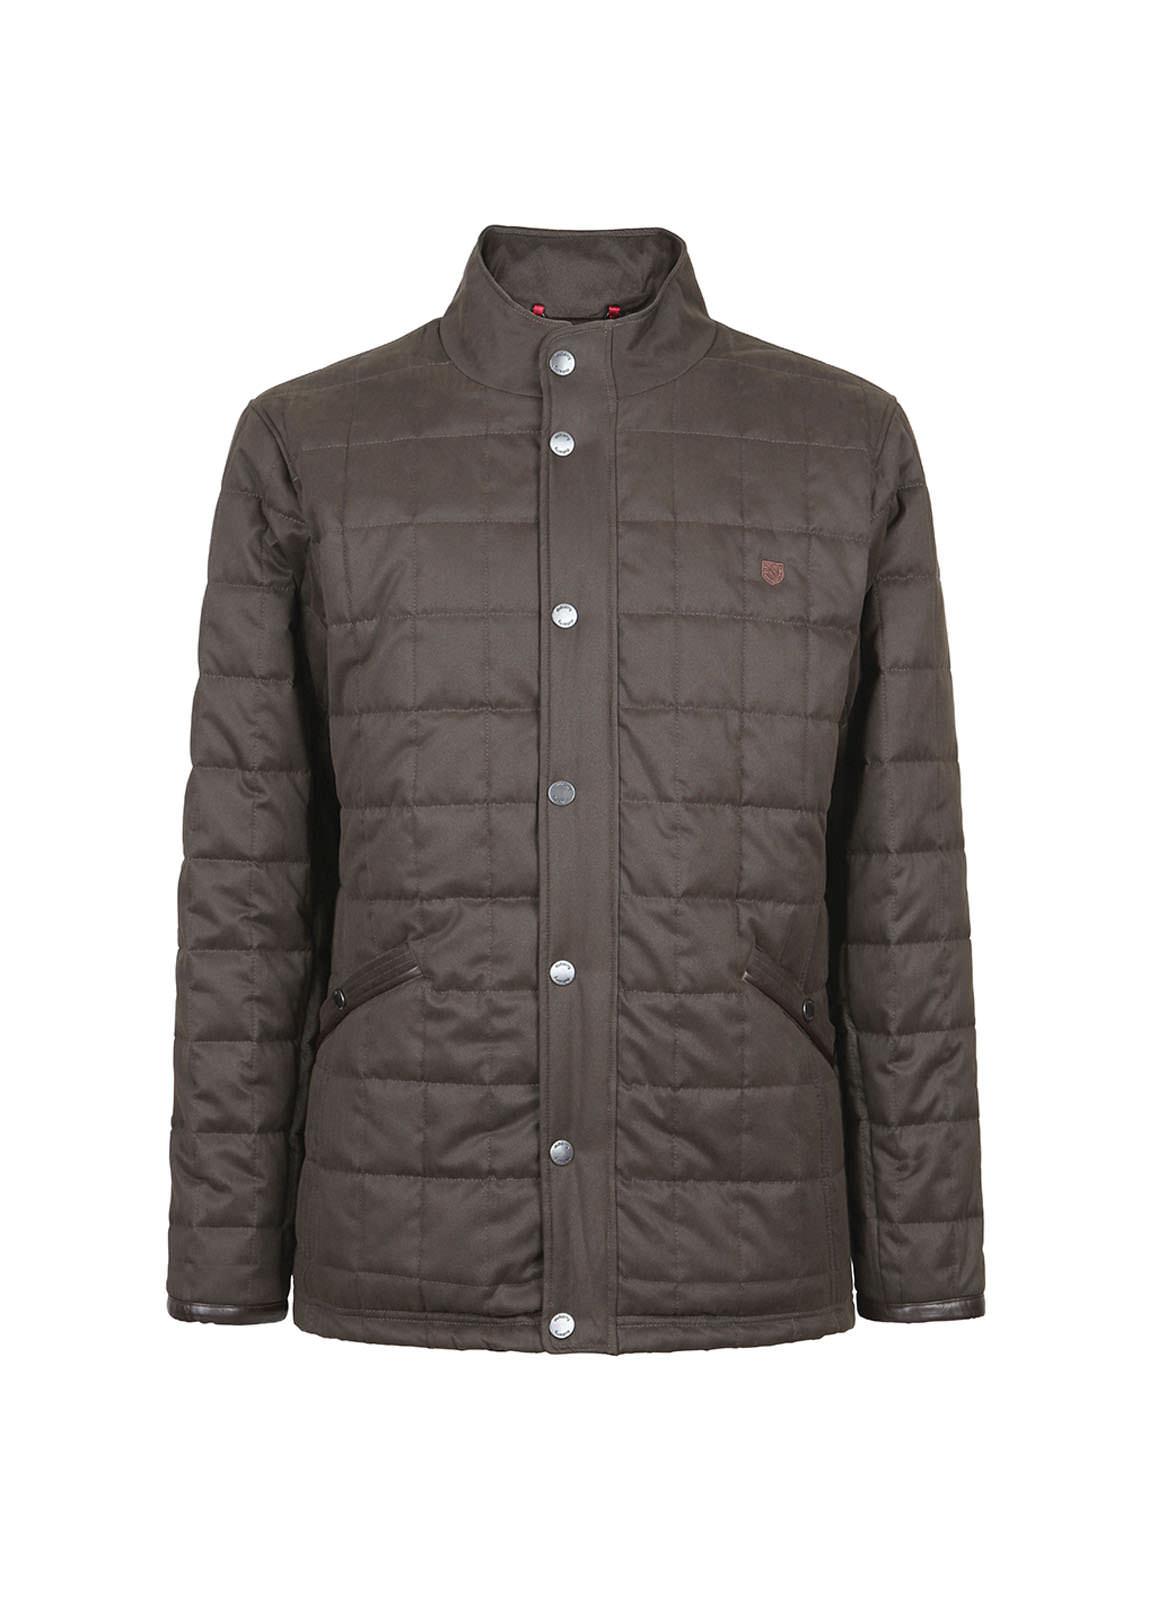 Dubarry_ Beckett Quilted Jacket - Verdigris_Image_2